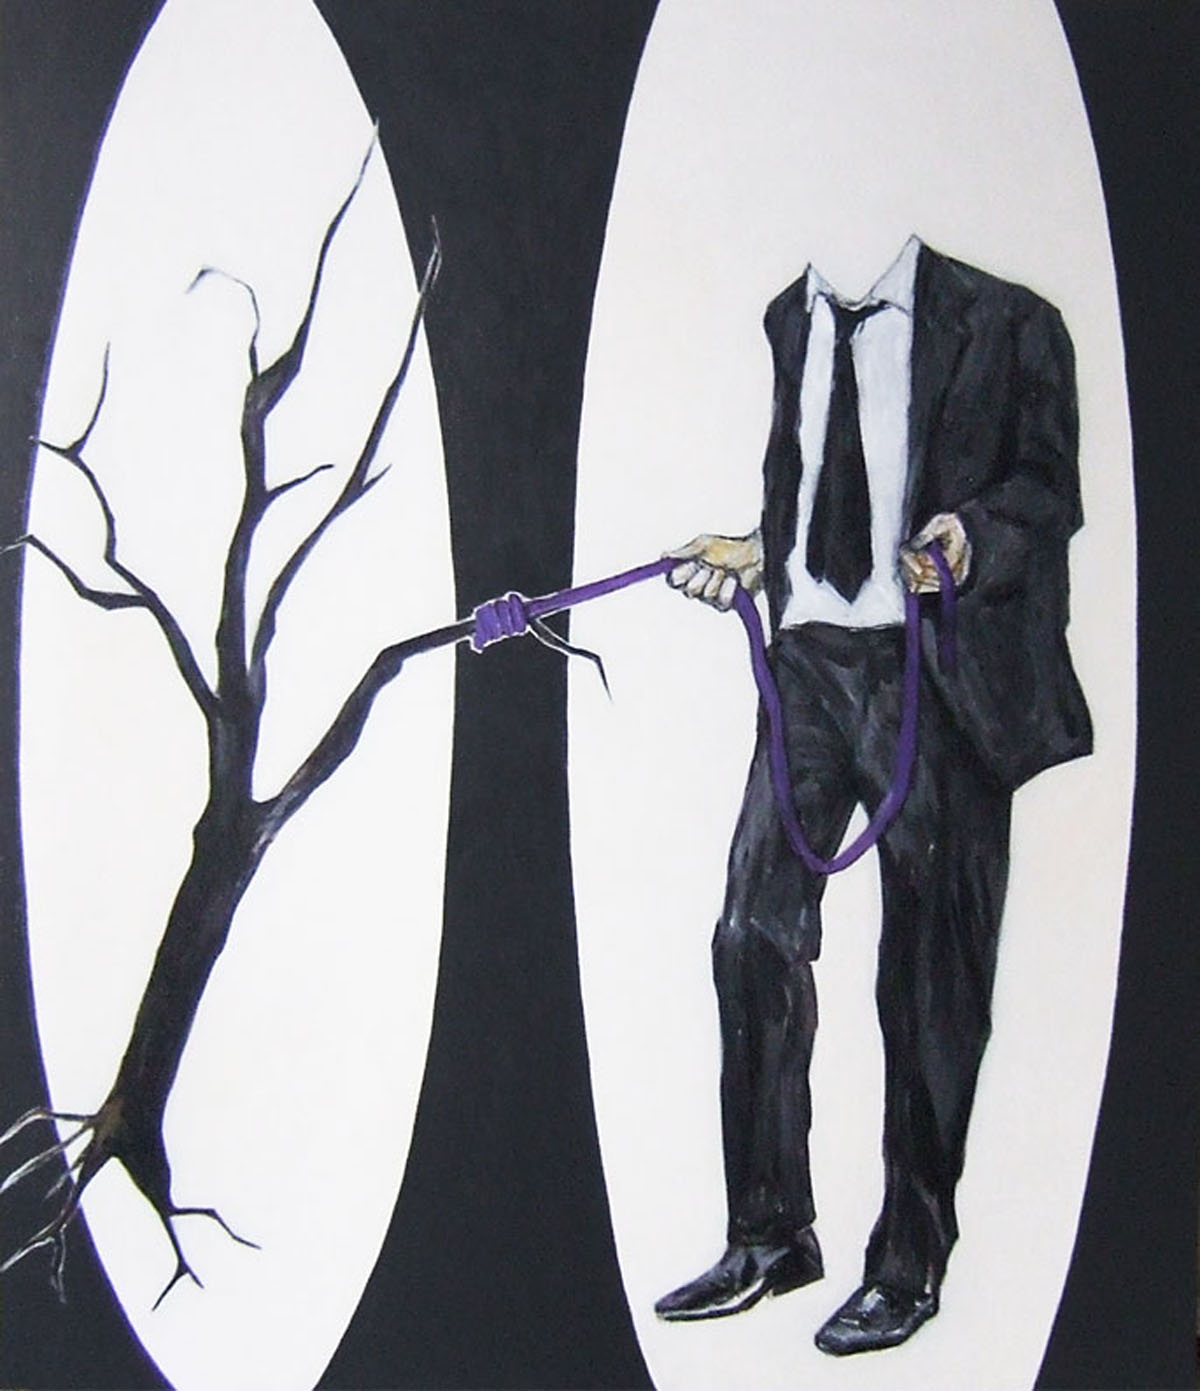 Benjamin Girard : La main verte